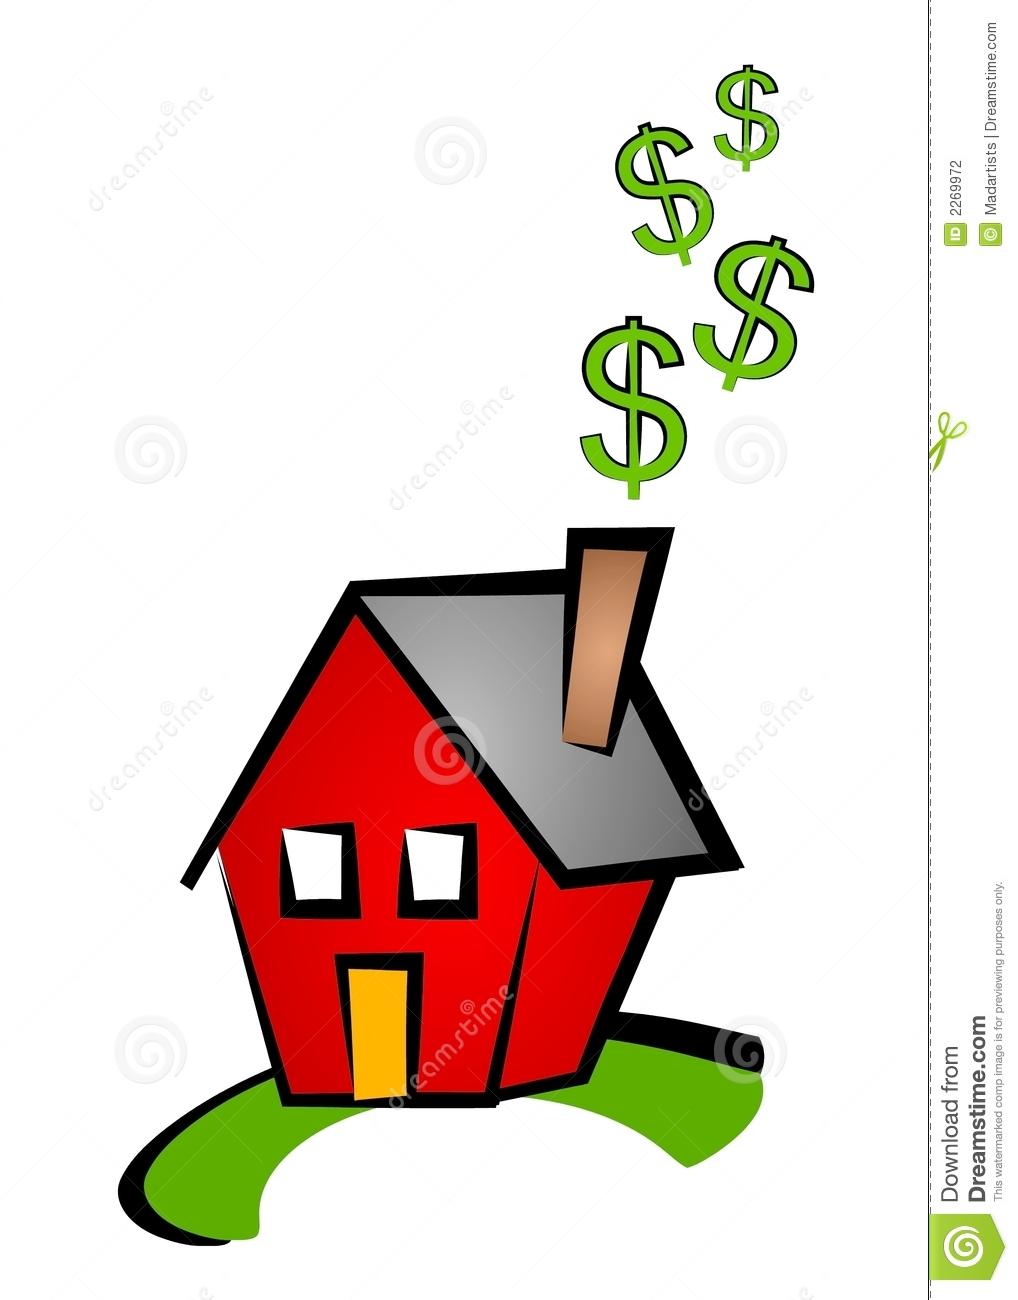 money house clipart - photo #4